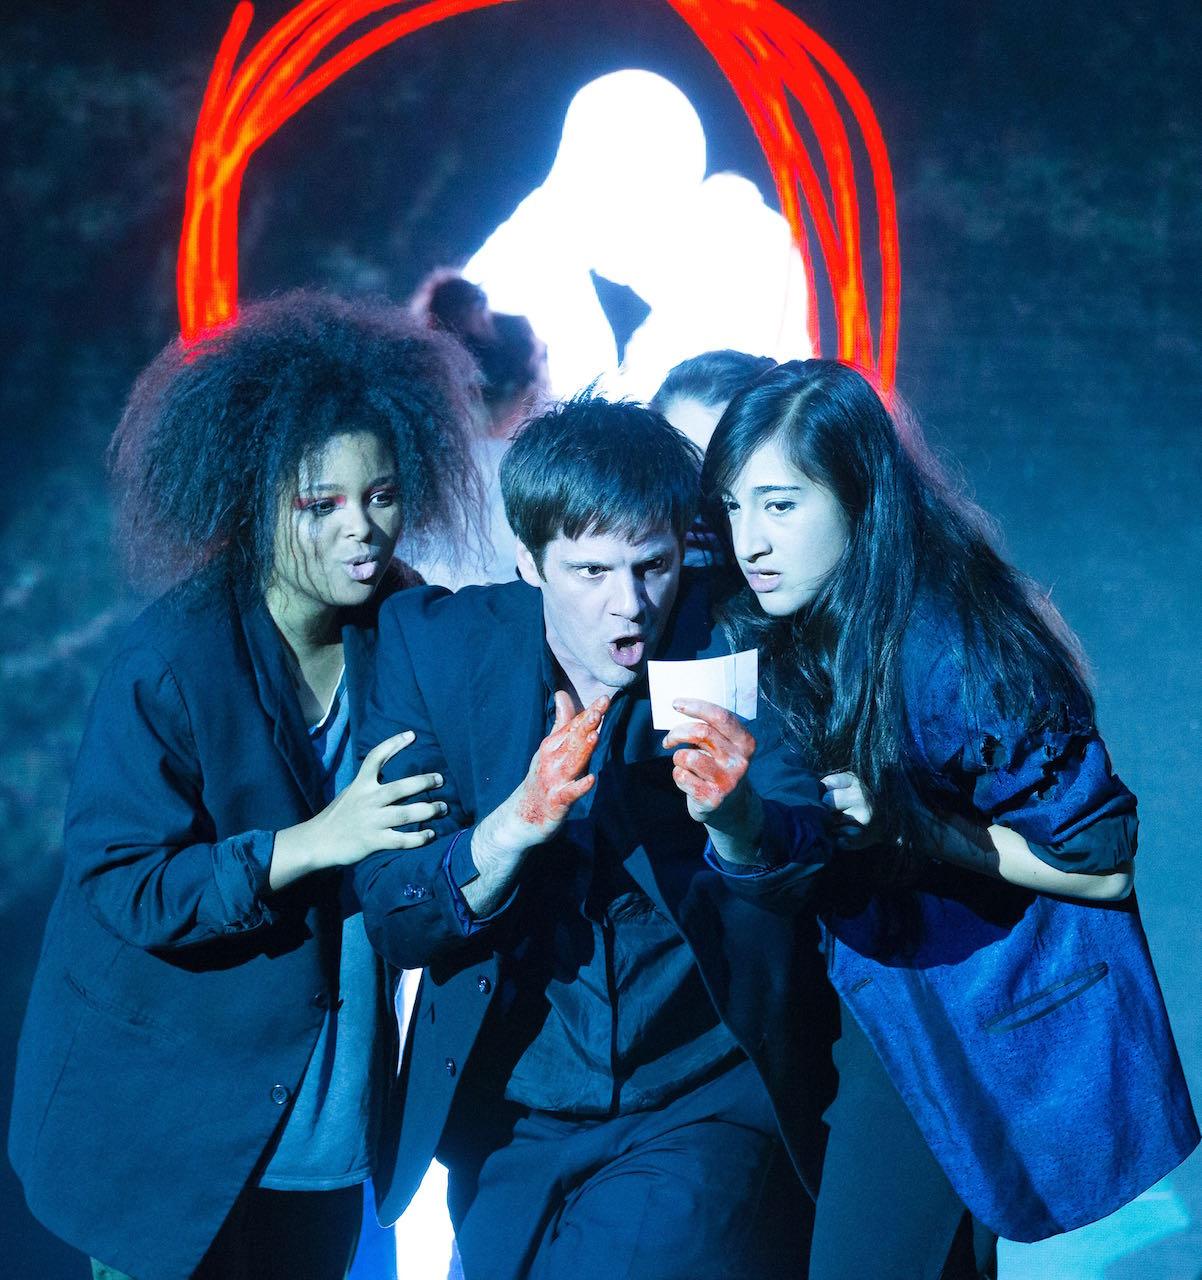 Brynn Williams, Michael Esper, and Krystina Alabado in 'Lazarus' (photo by Jan Versweyveld)